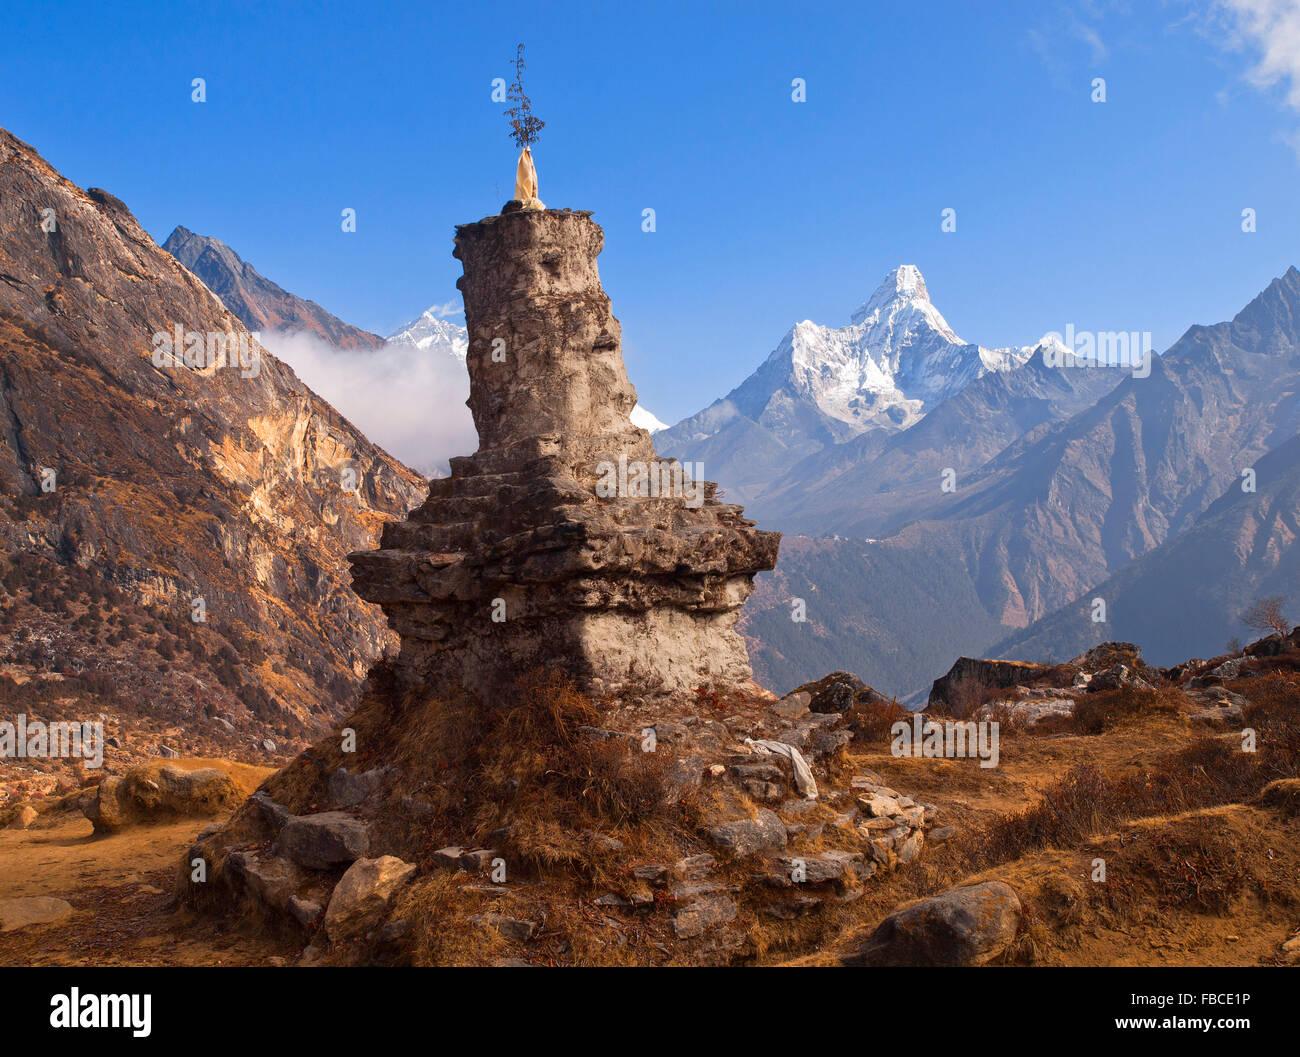 Lieu de culte avec l'Ama Dablam, Himalaya au Népal Photo Stock